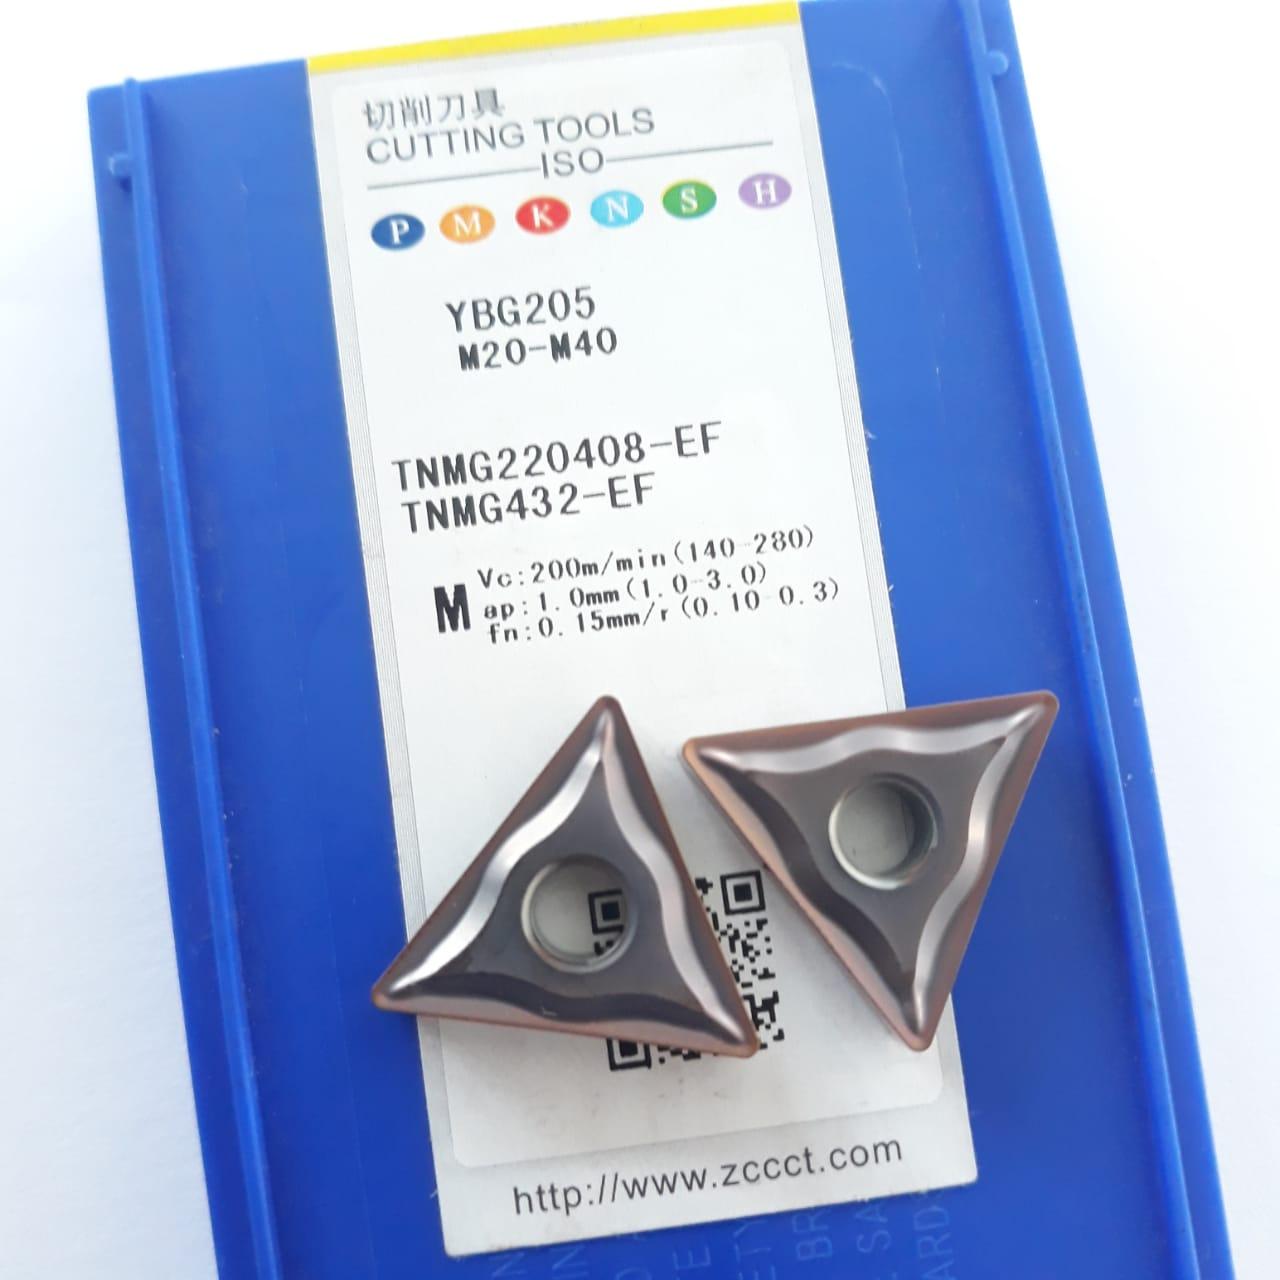 Inserto Pastilha TNMG 220408-EF YBG205 (INOX) - Caixa com 10 Peças - ZCC-CT